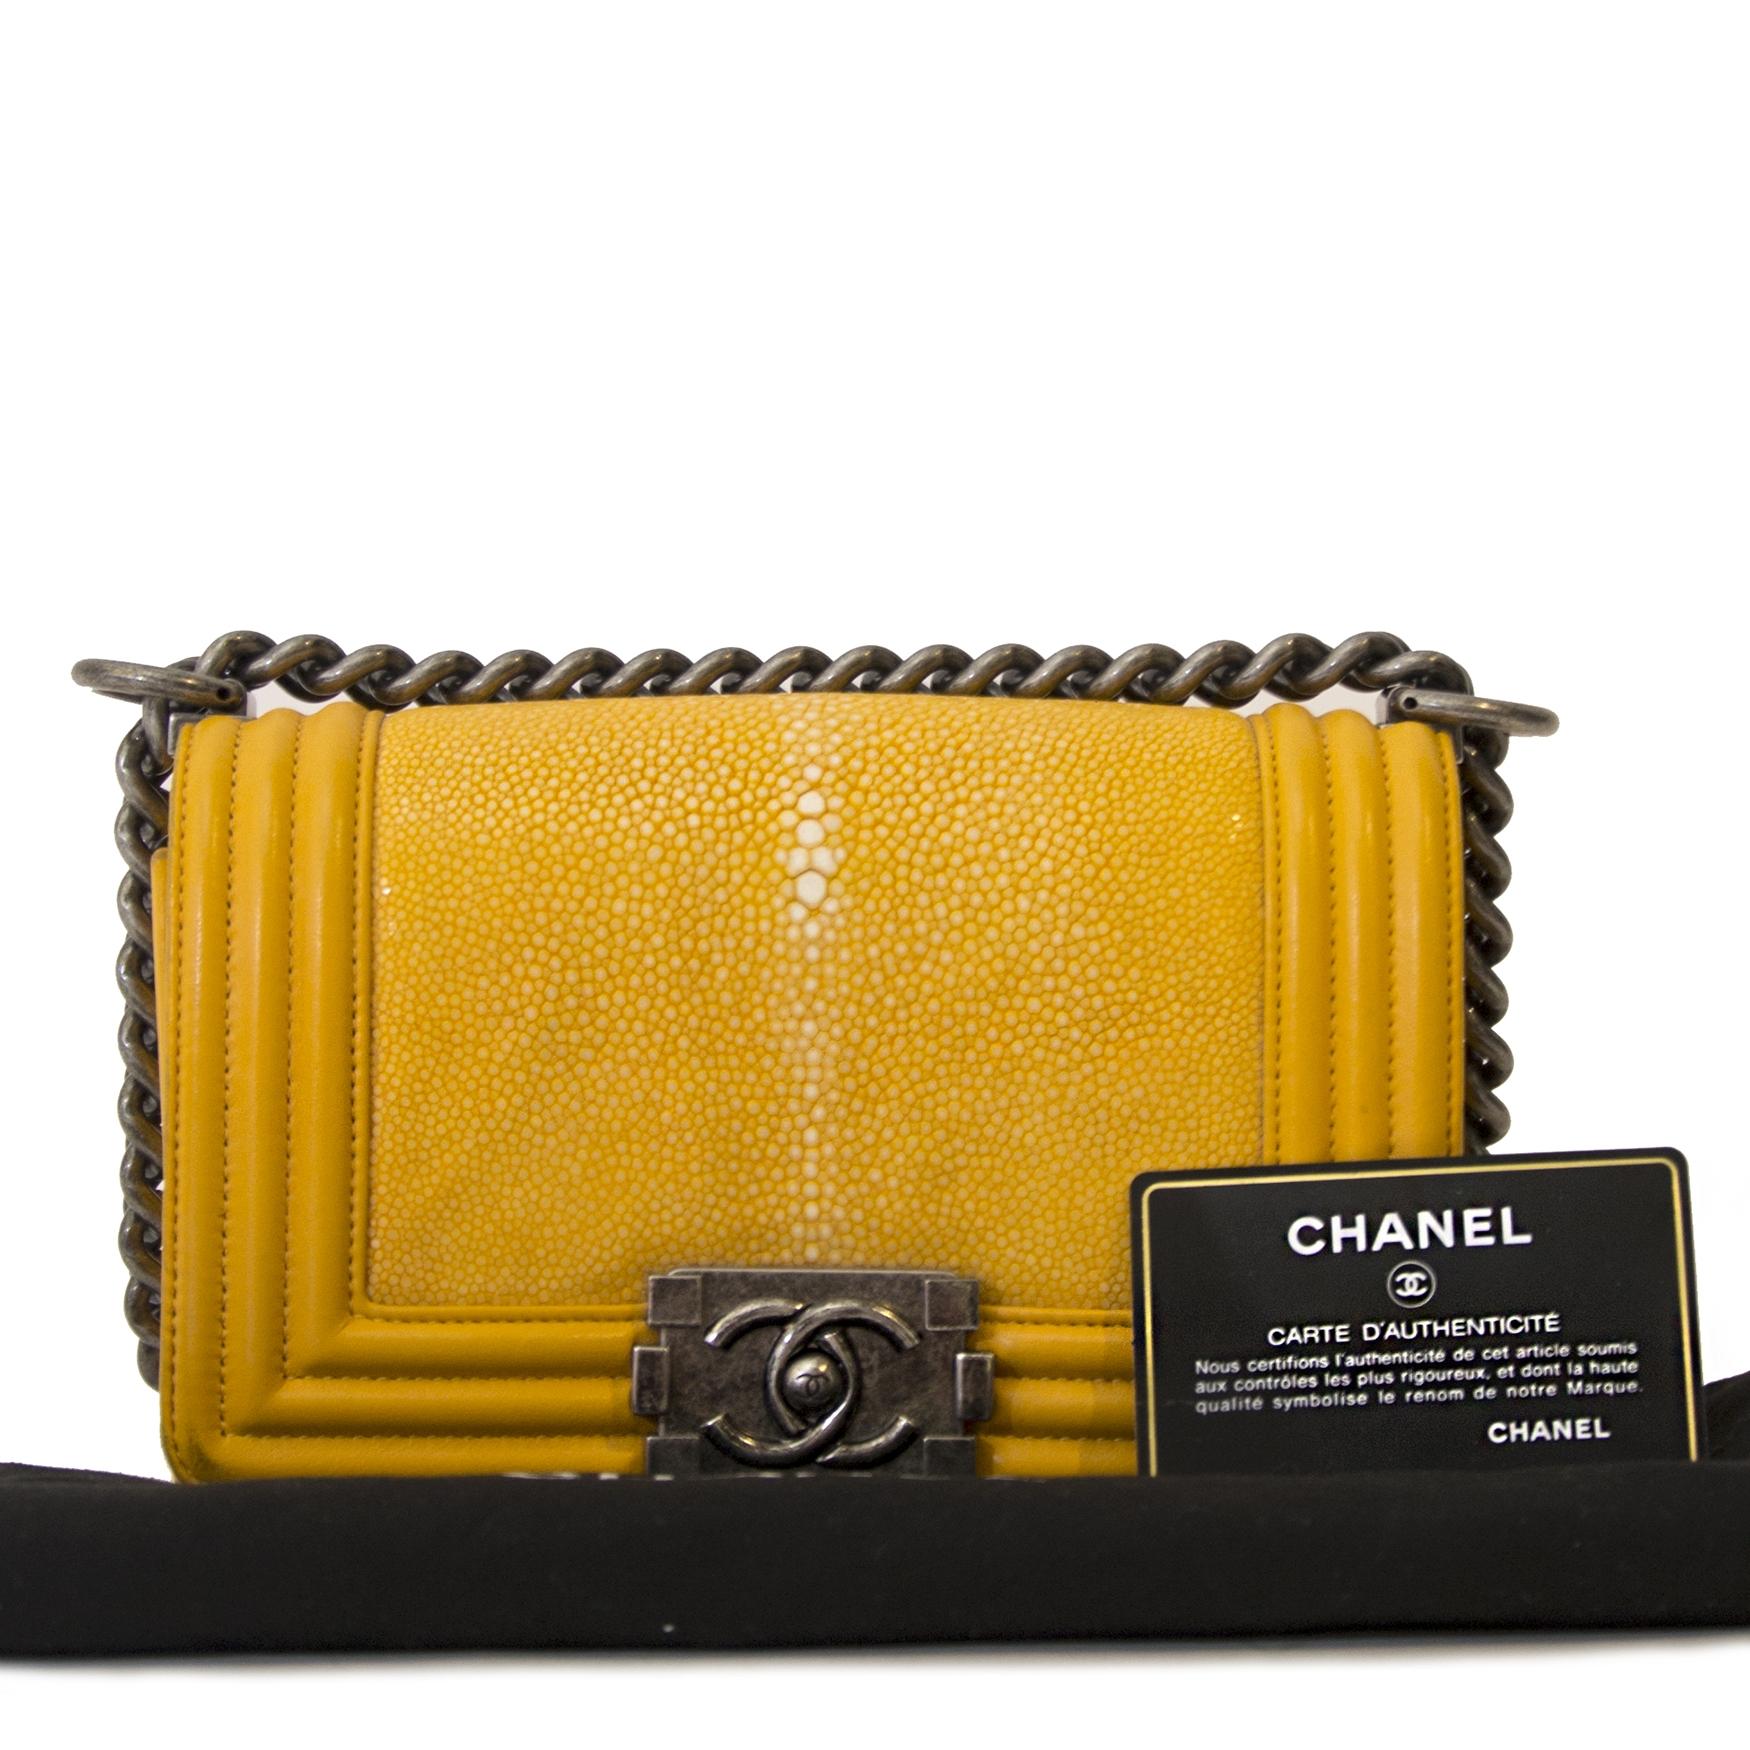 cd277214f415 ... Chanel Small Yellow Galuchat Stingray Lambskin Boy Bag acheter en ligne  seconde main